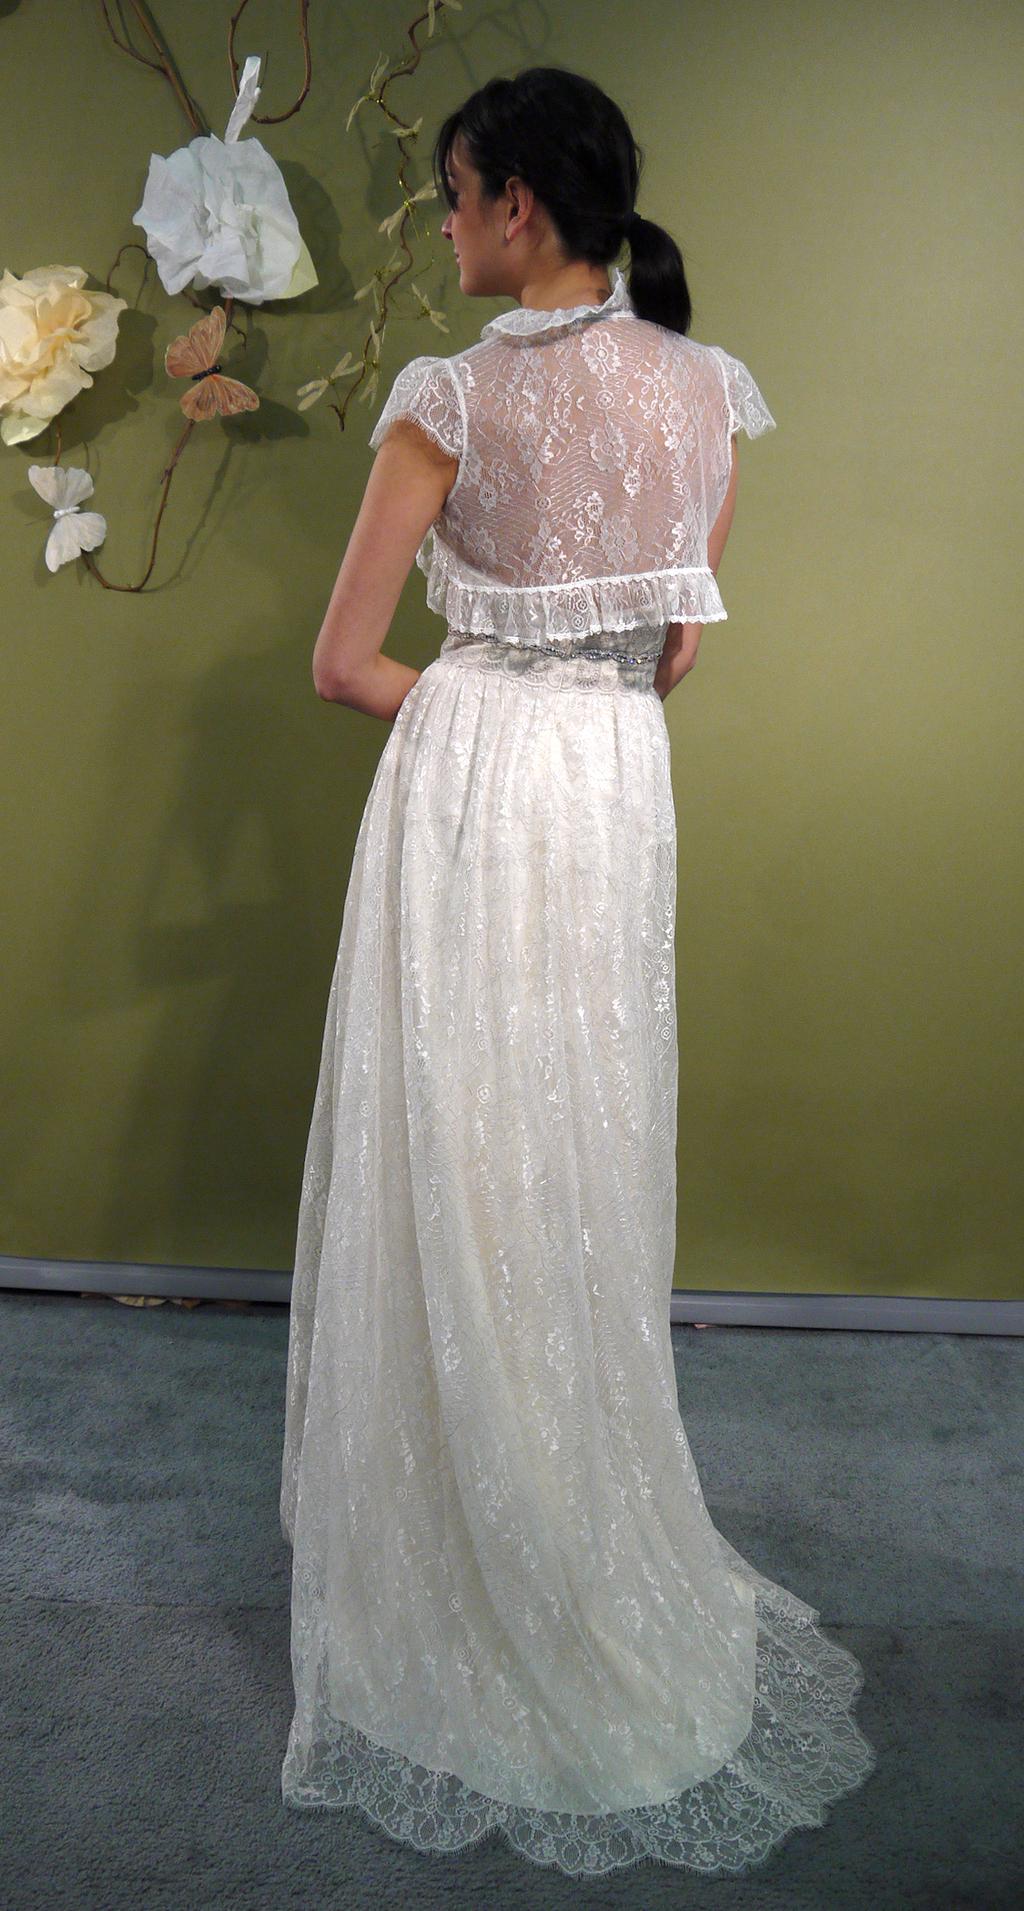 Fall-2011-wedding-dresses-norah-strapless-empire-wedding-dress-beaded-bridal-belt-claire-pettibone-cap-sleeved-bolero-back-large.full